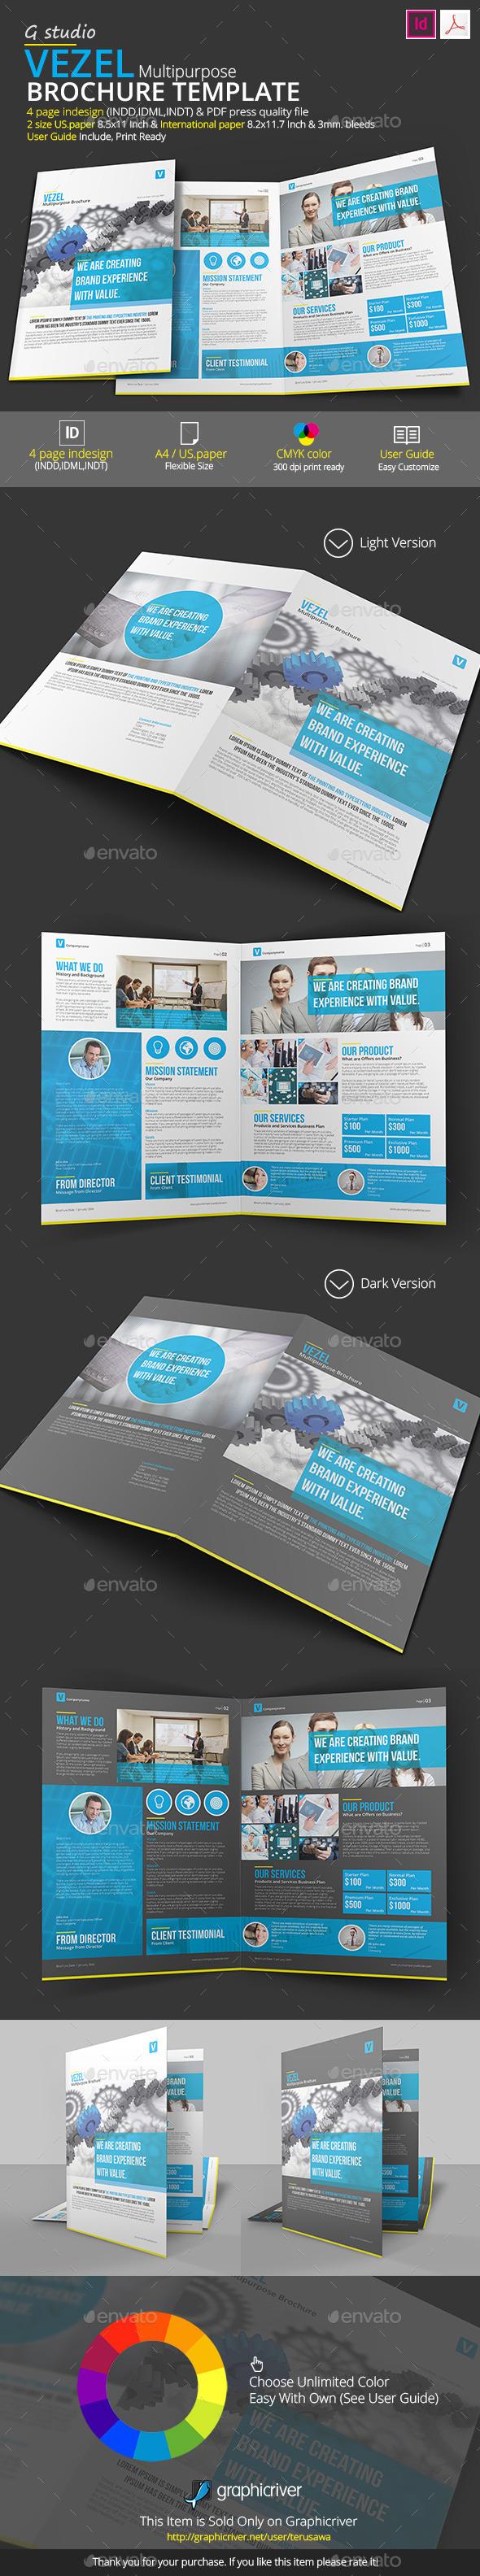 GraphicRiver Vezel Brochure Template 9486378